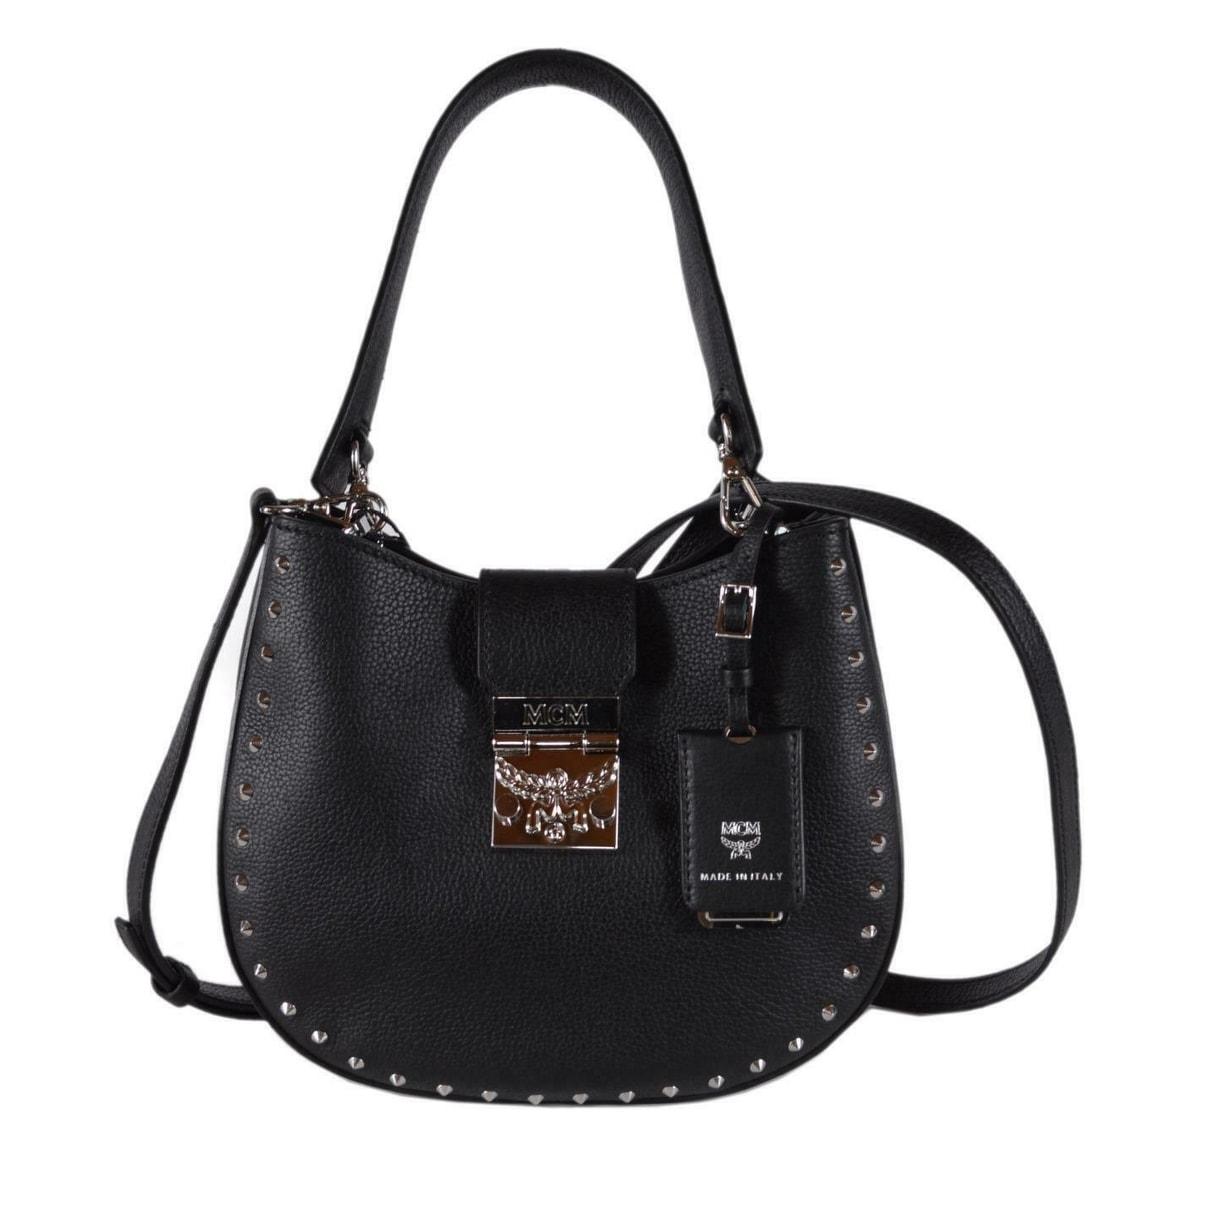 Mcm Trisha Small Black Studded